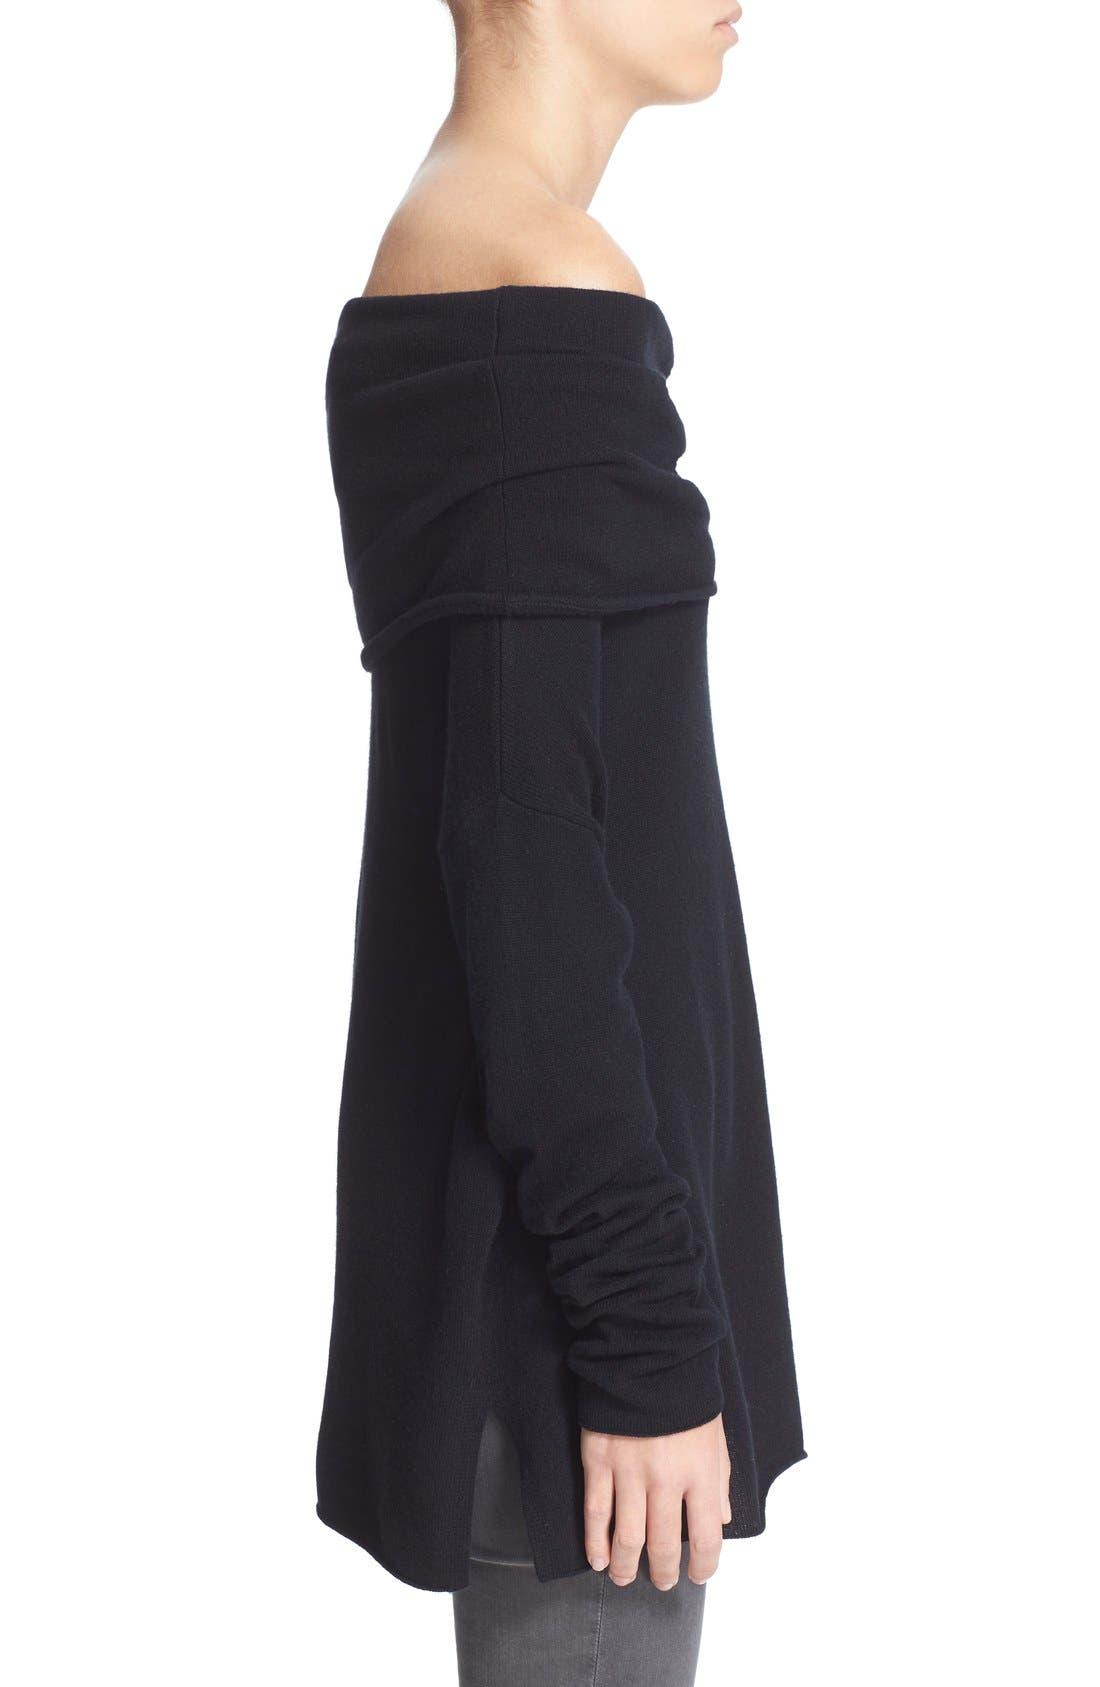 VINCE,                             Cashmere Off the Shoulder Pullover,                             Alternate thumbnail 4, color,                             001